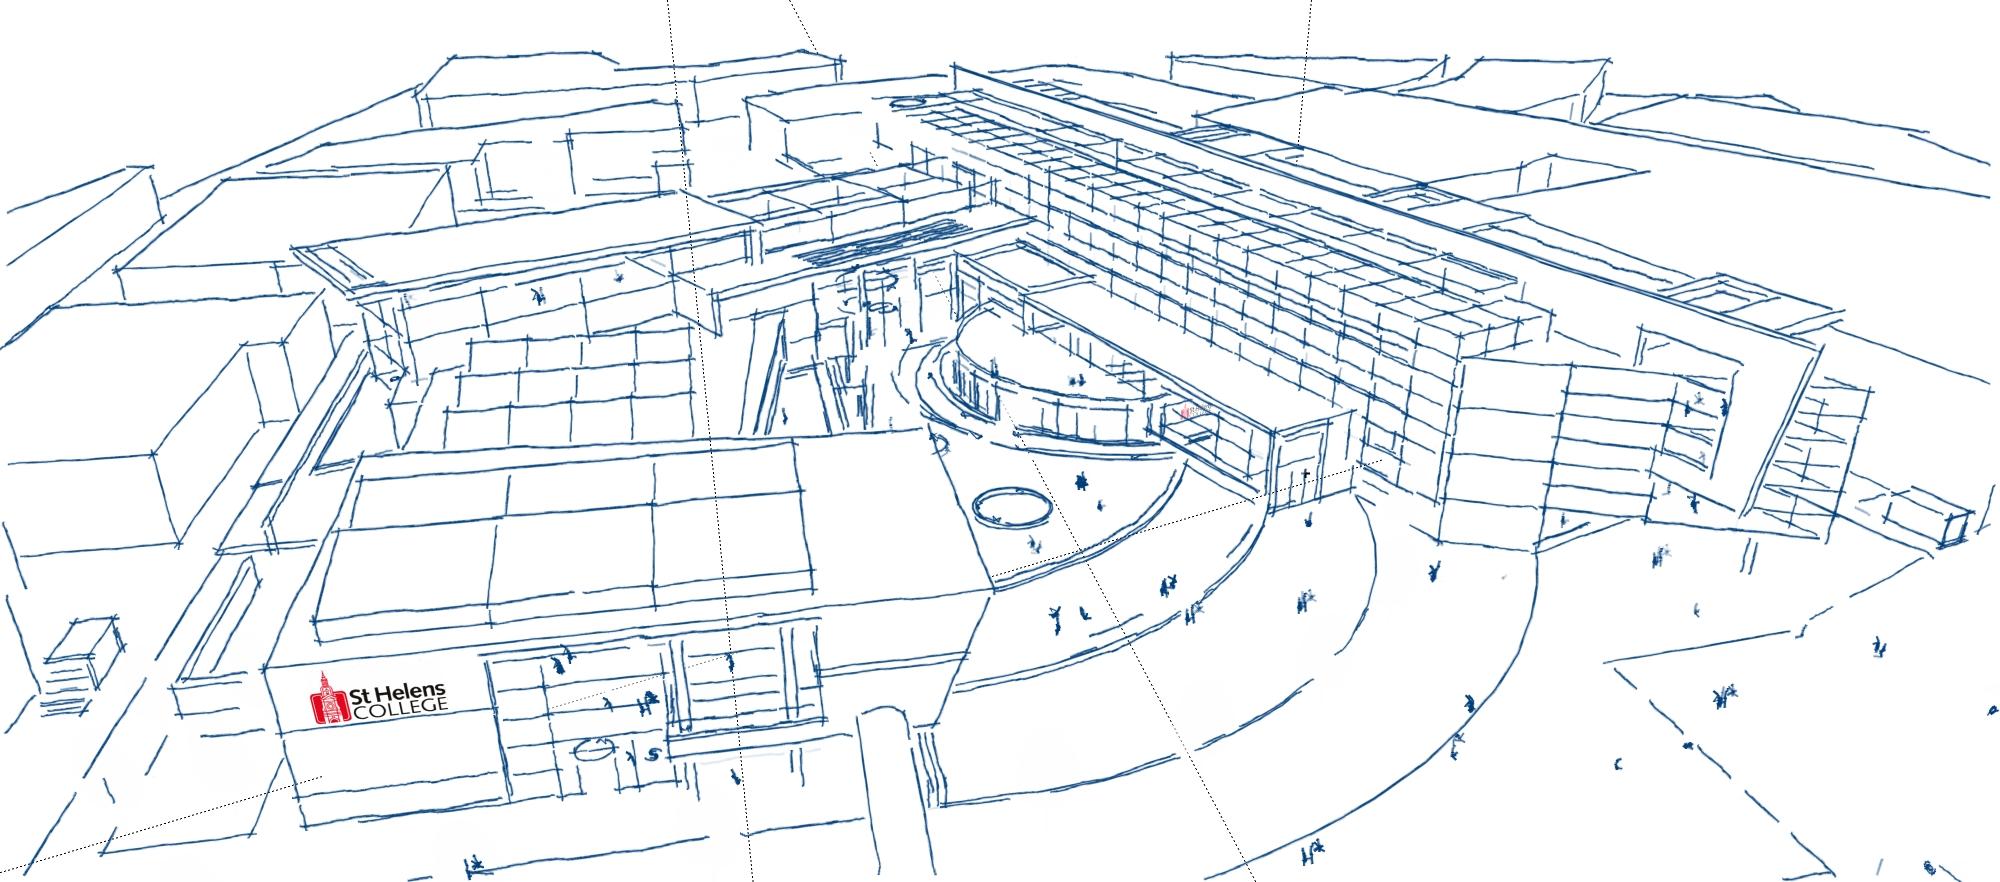 St Helen's College sketch